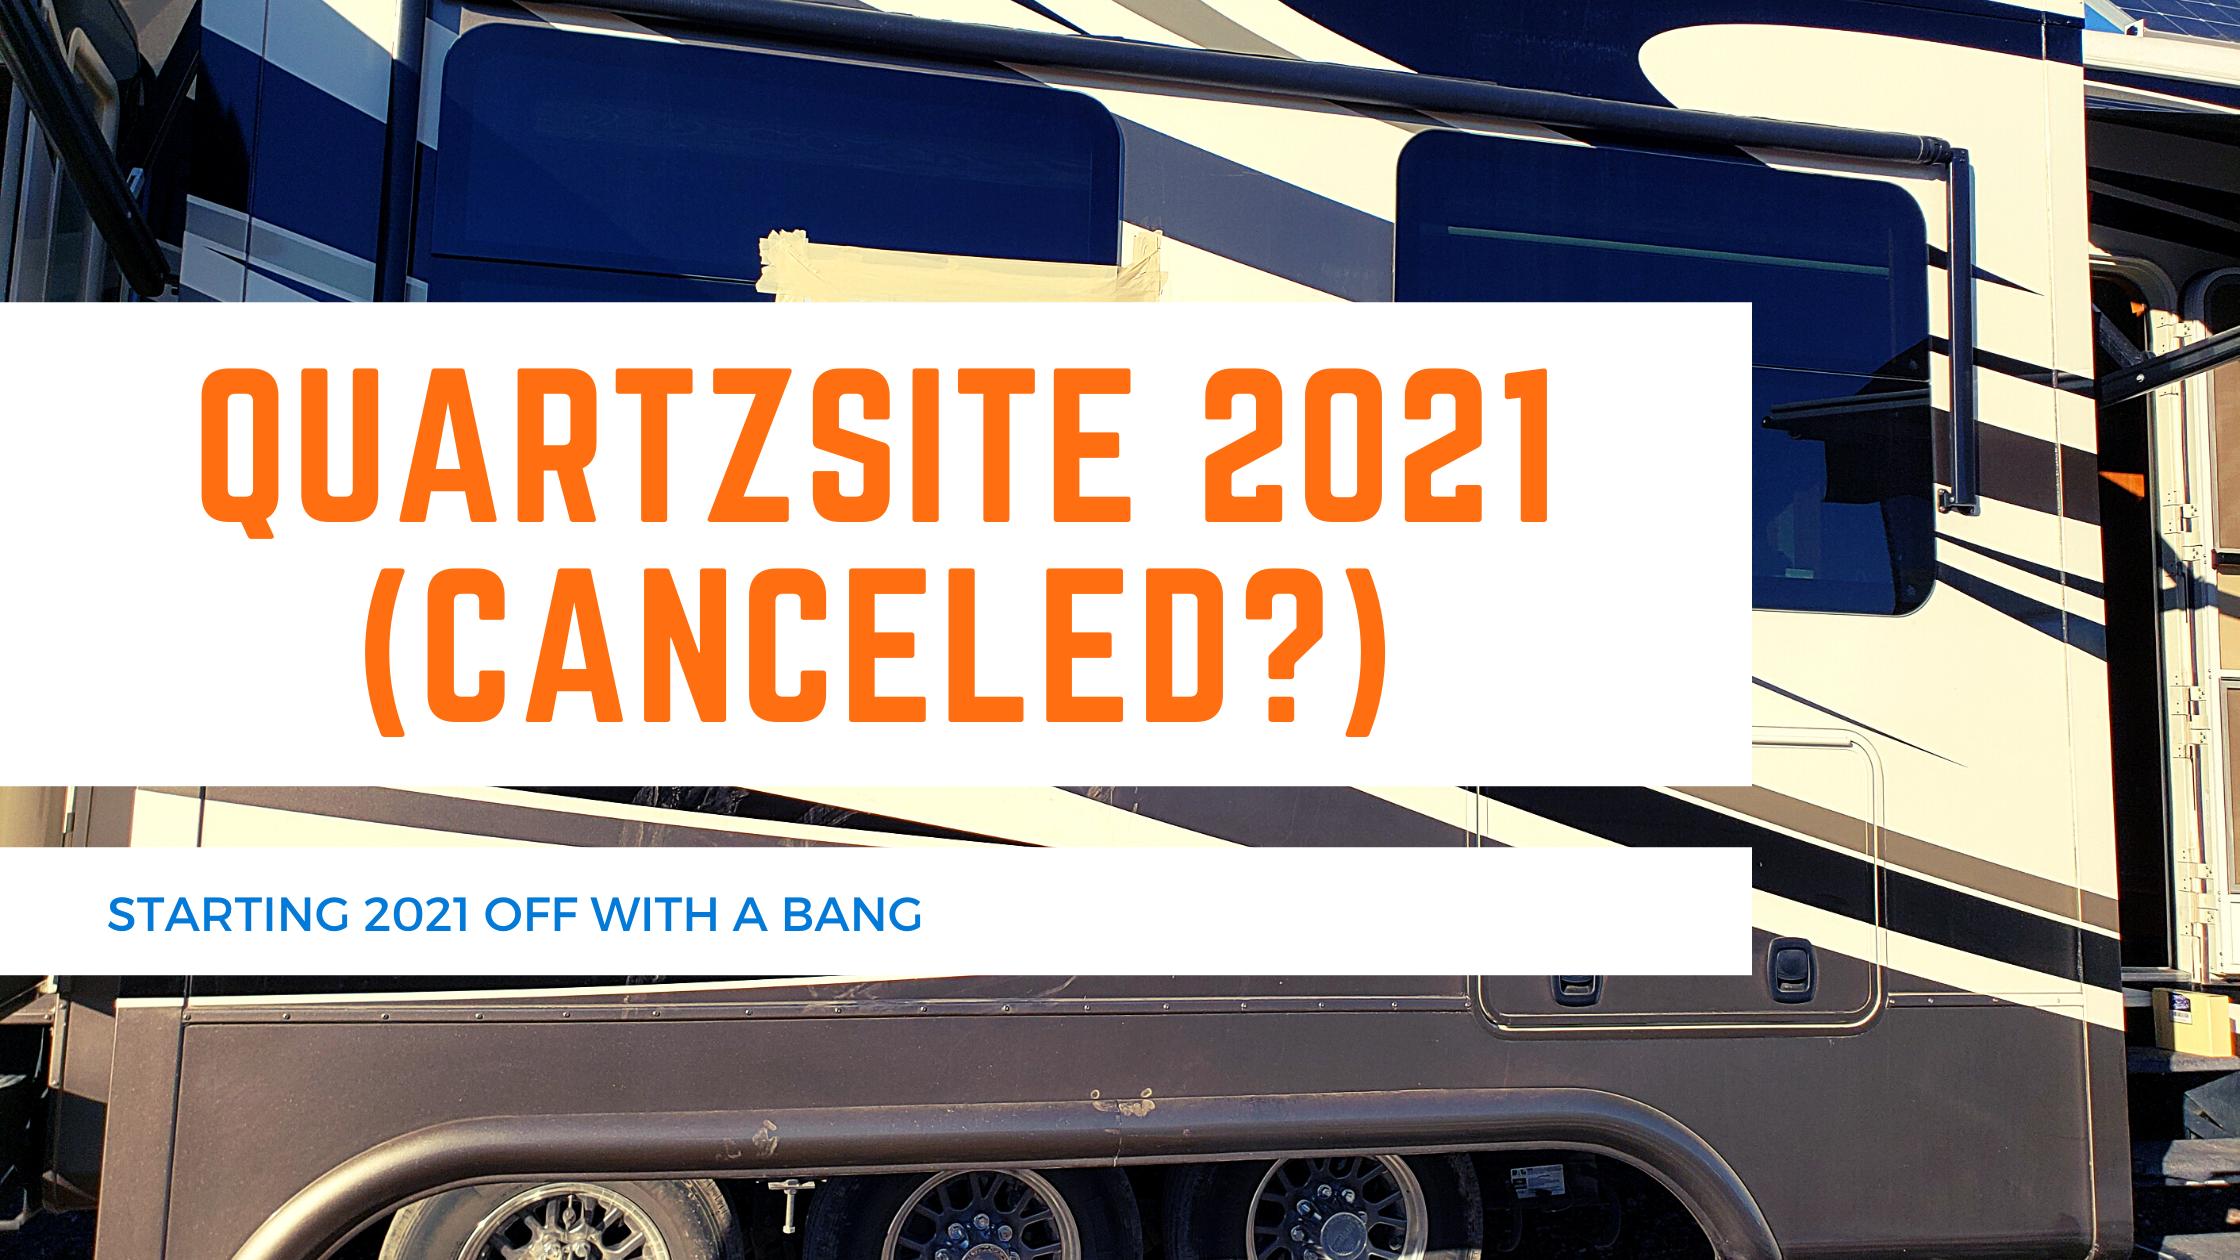 QUARTZSITE 2021 (CANCELED?)